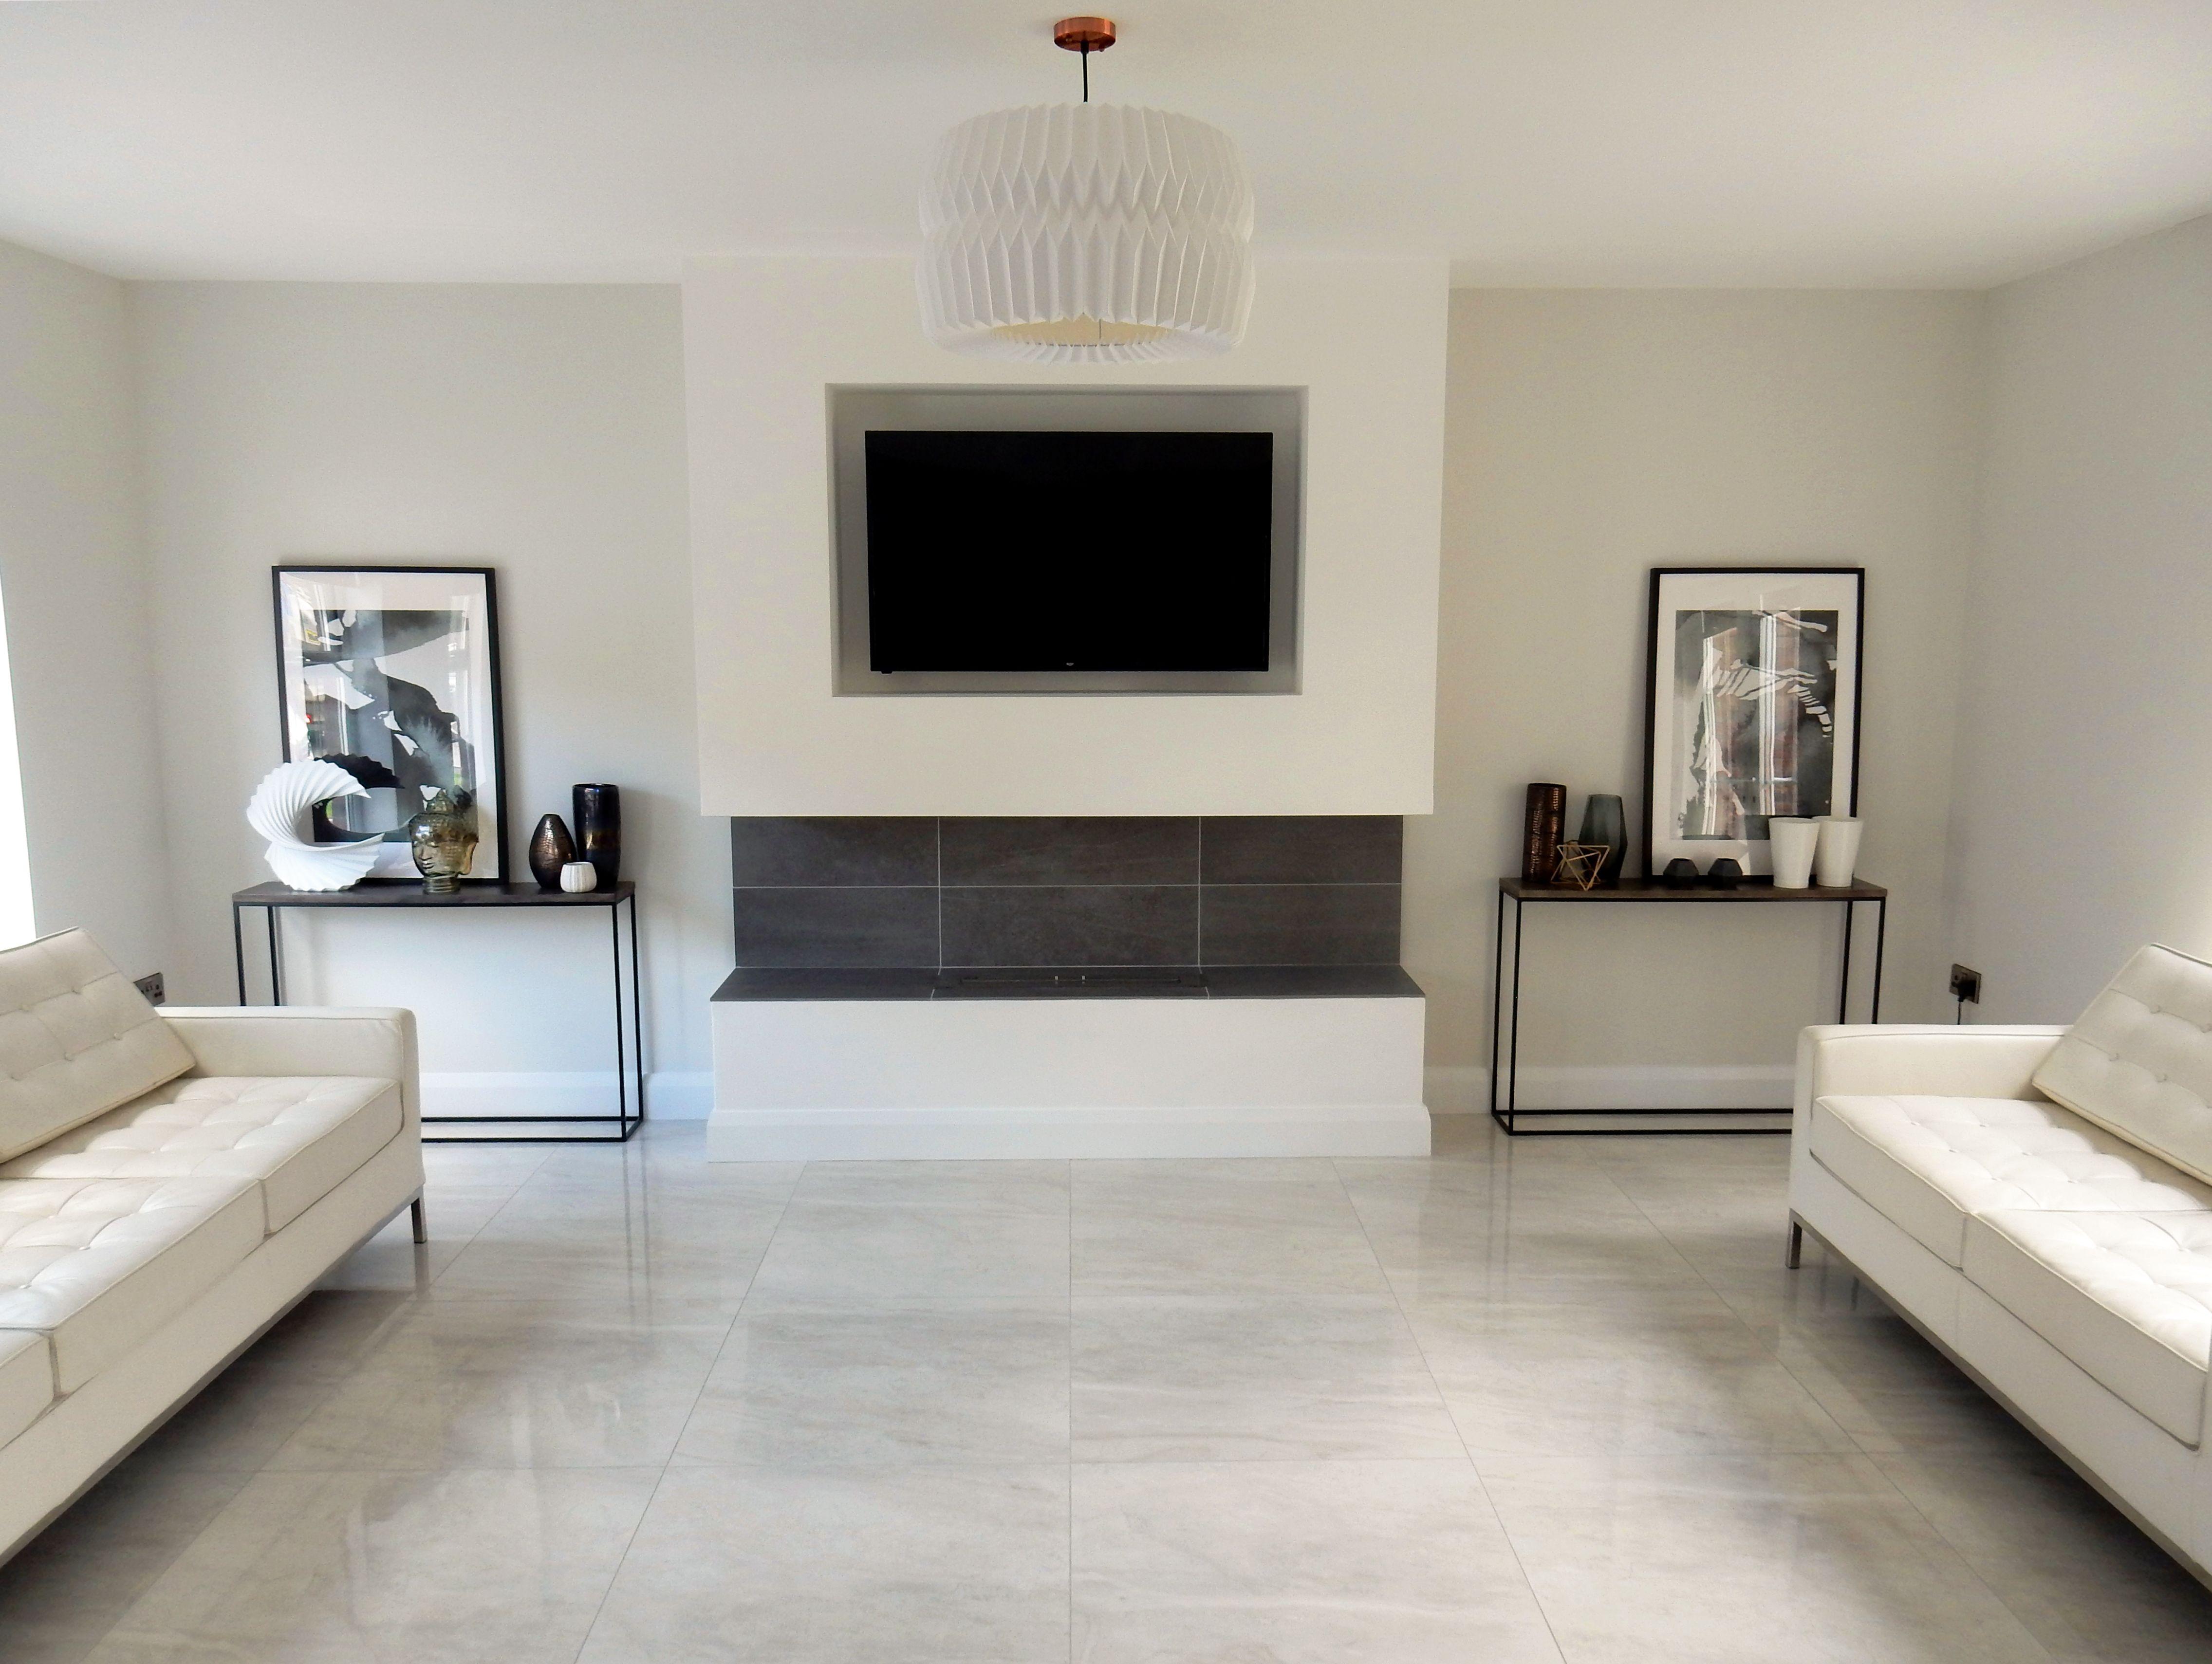 Stunning Shiny Grey Floor Tiles In Living Area Luxury Tile